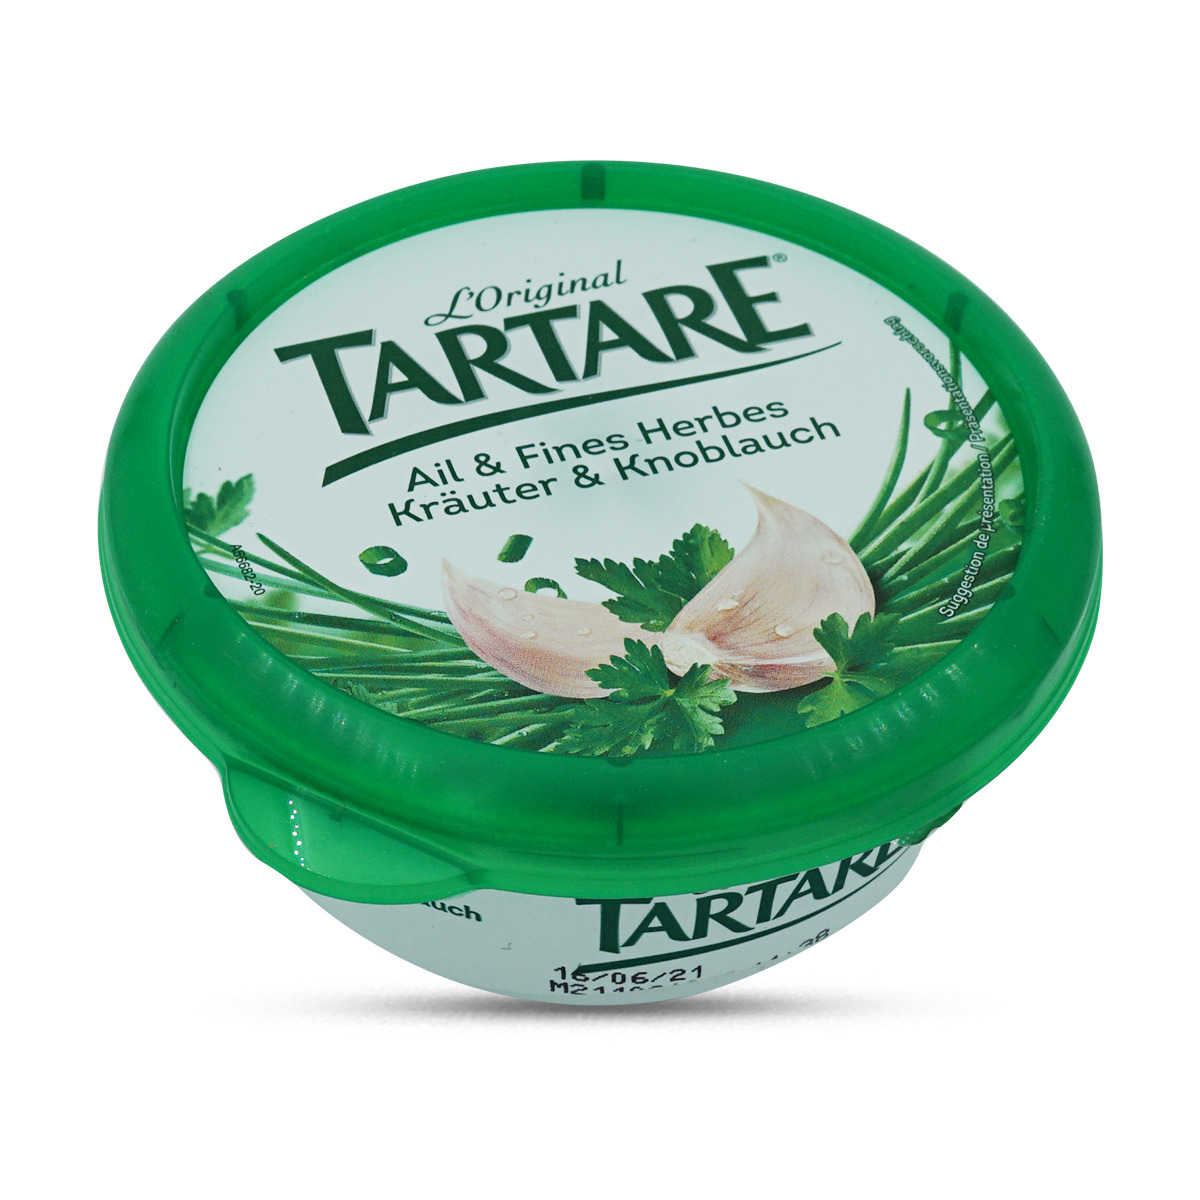 Tartare L'Original